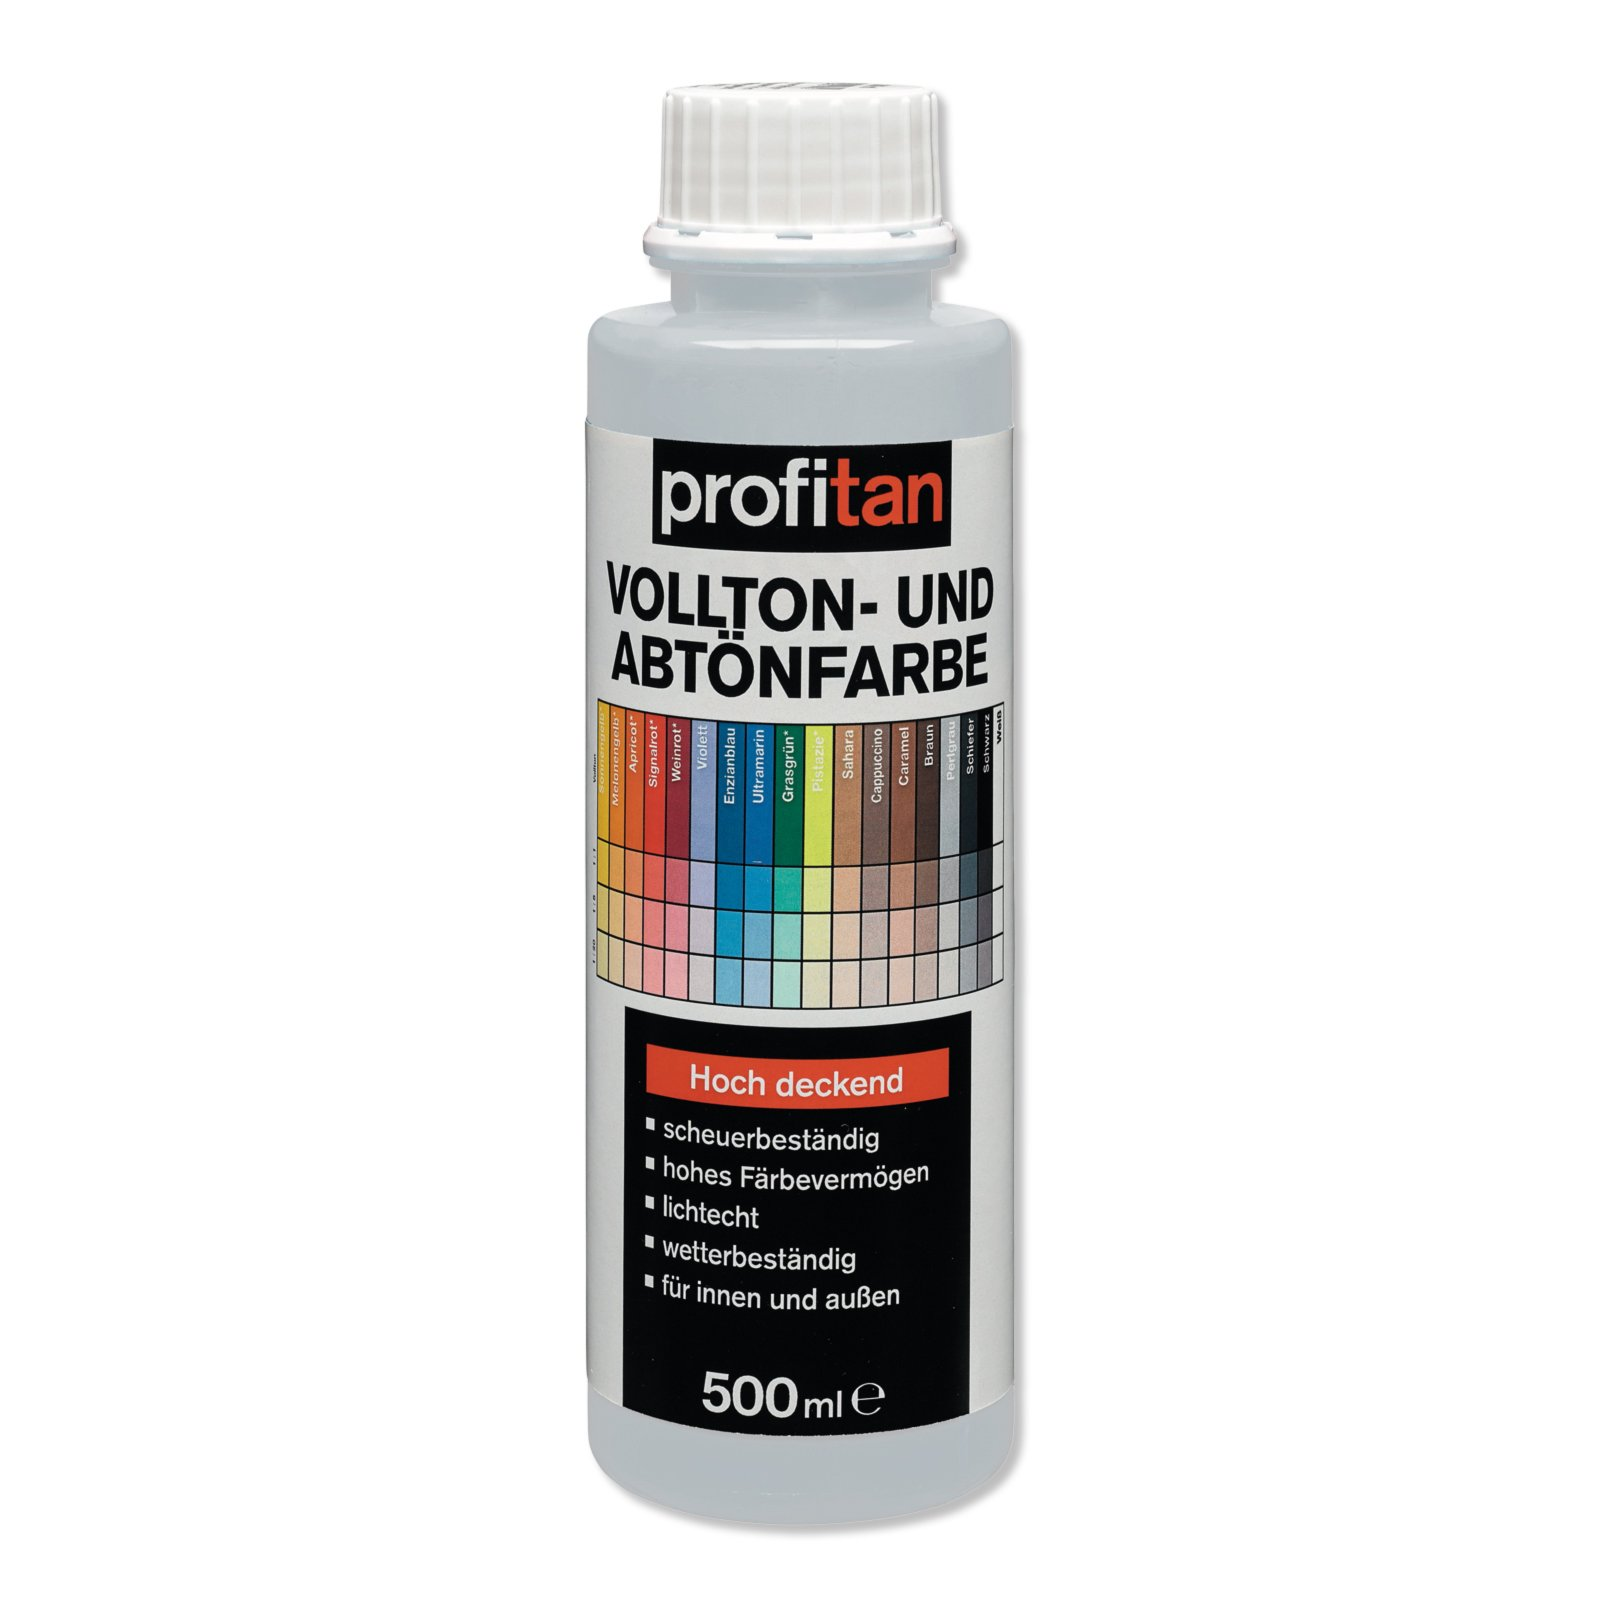 profitan Vollton- und Abtönfarbe - perlgrau - 500 ml